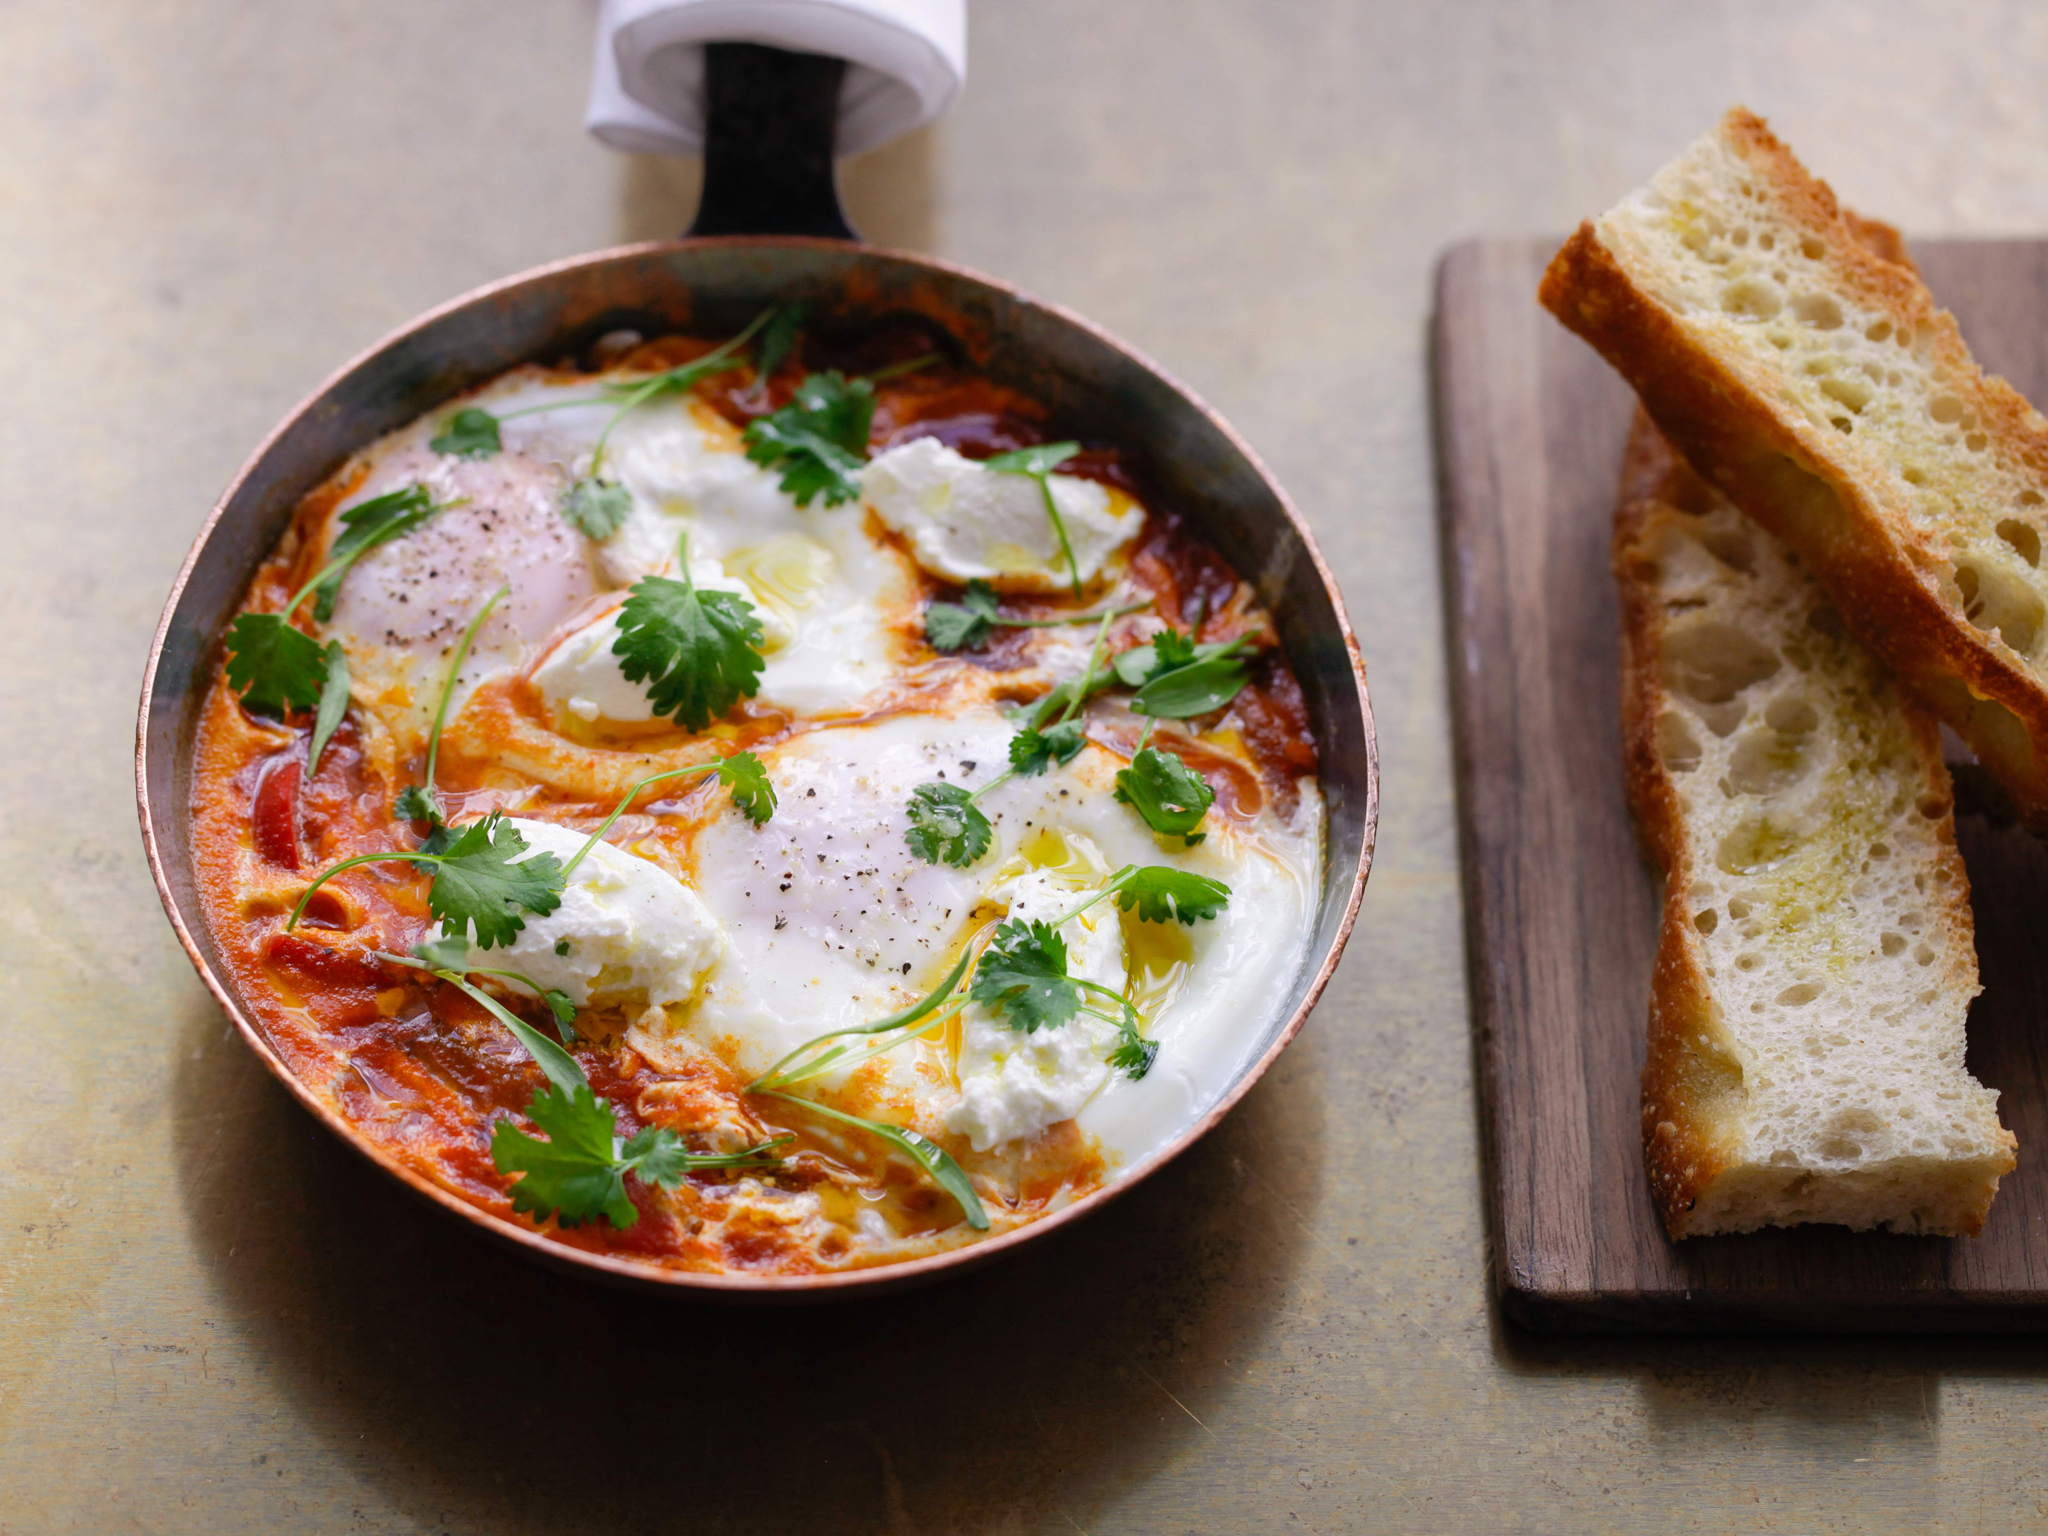 Egg dishes in London, Shakshuka at Nopi